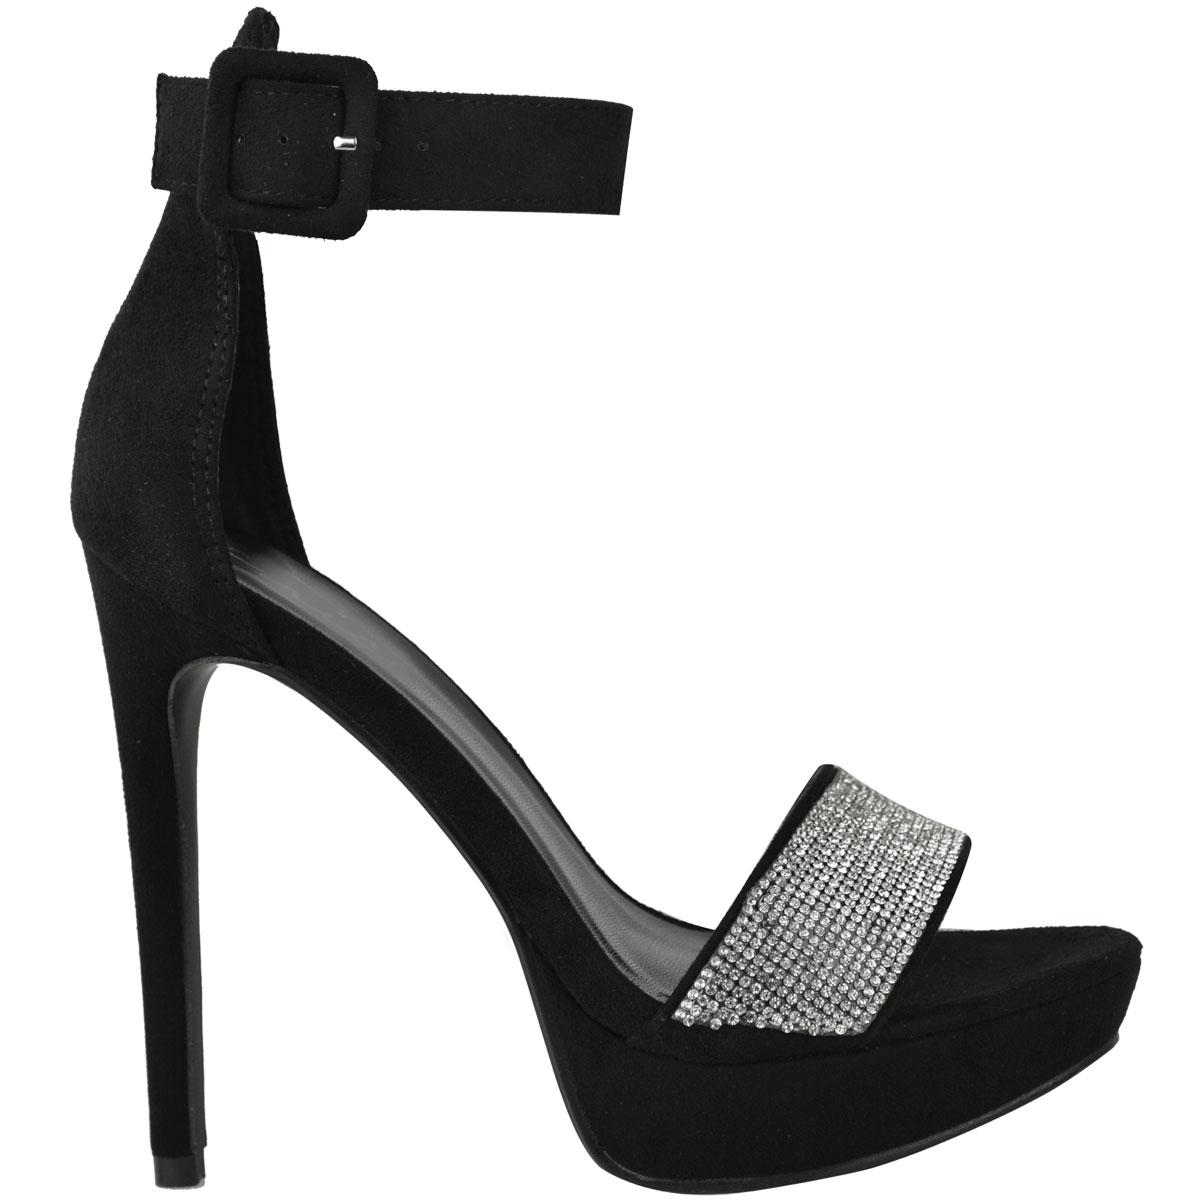 Womens-Ladies-Stilettos-High-Heels-Strappy-Platforms-Sandals-Diamante-Shoes-Size thumbnail 19